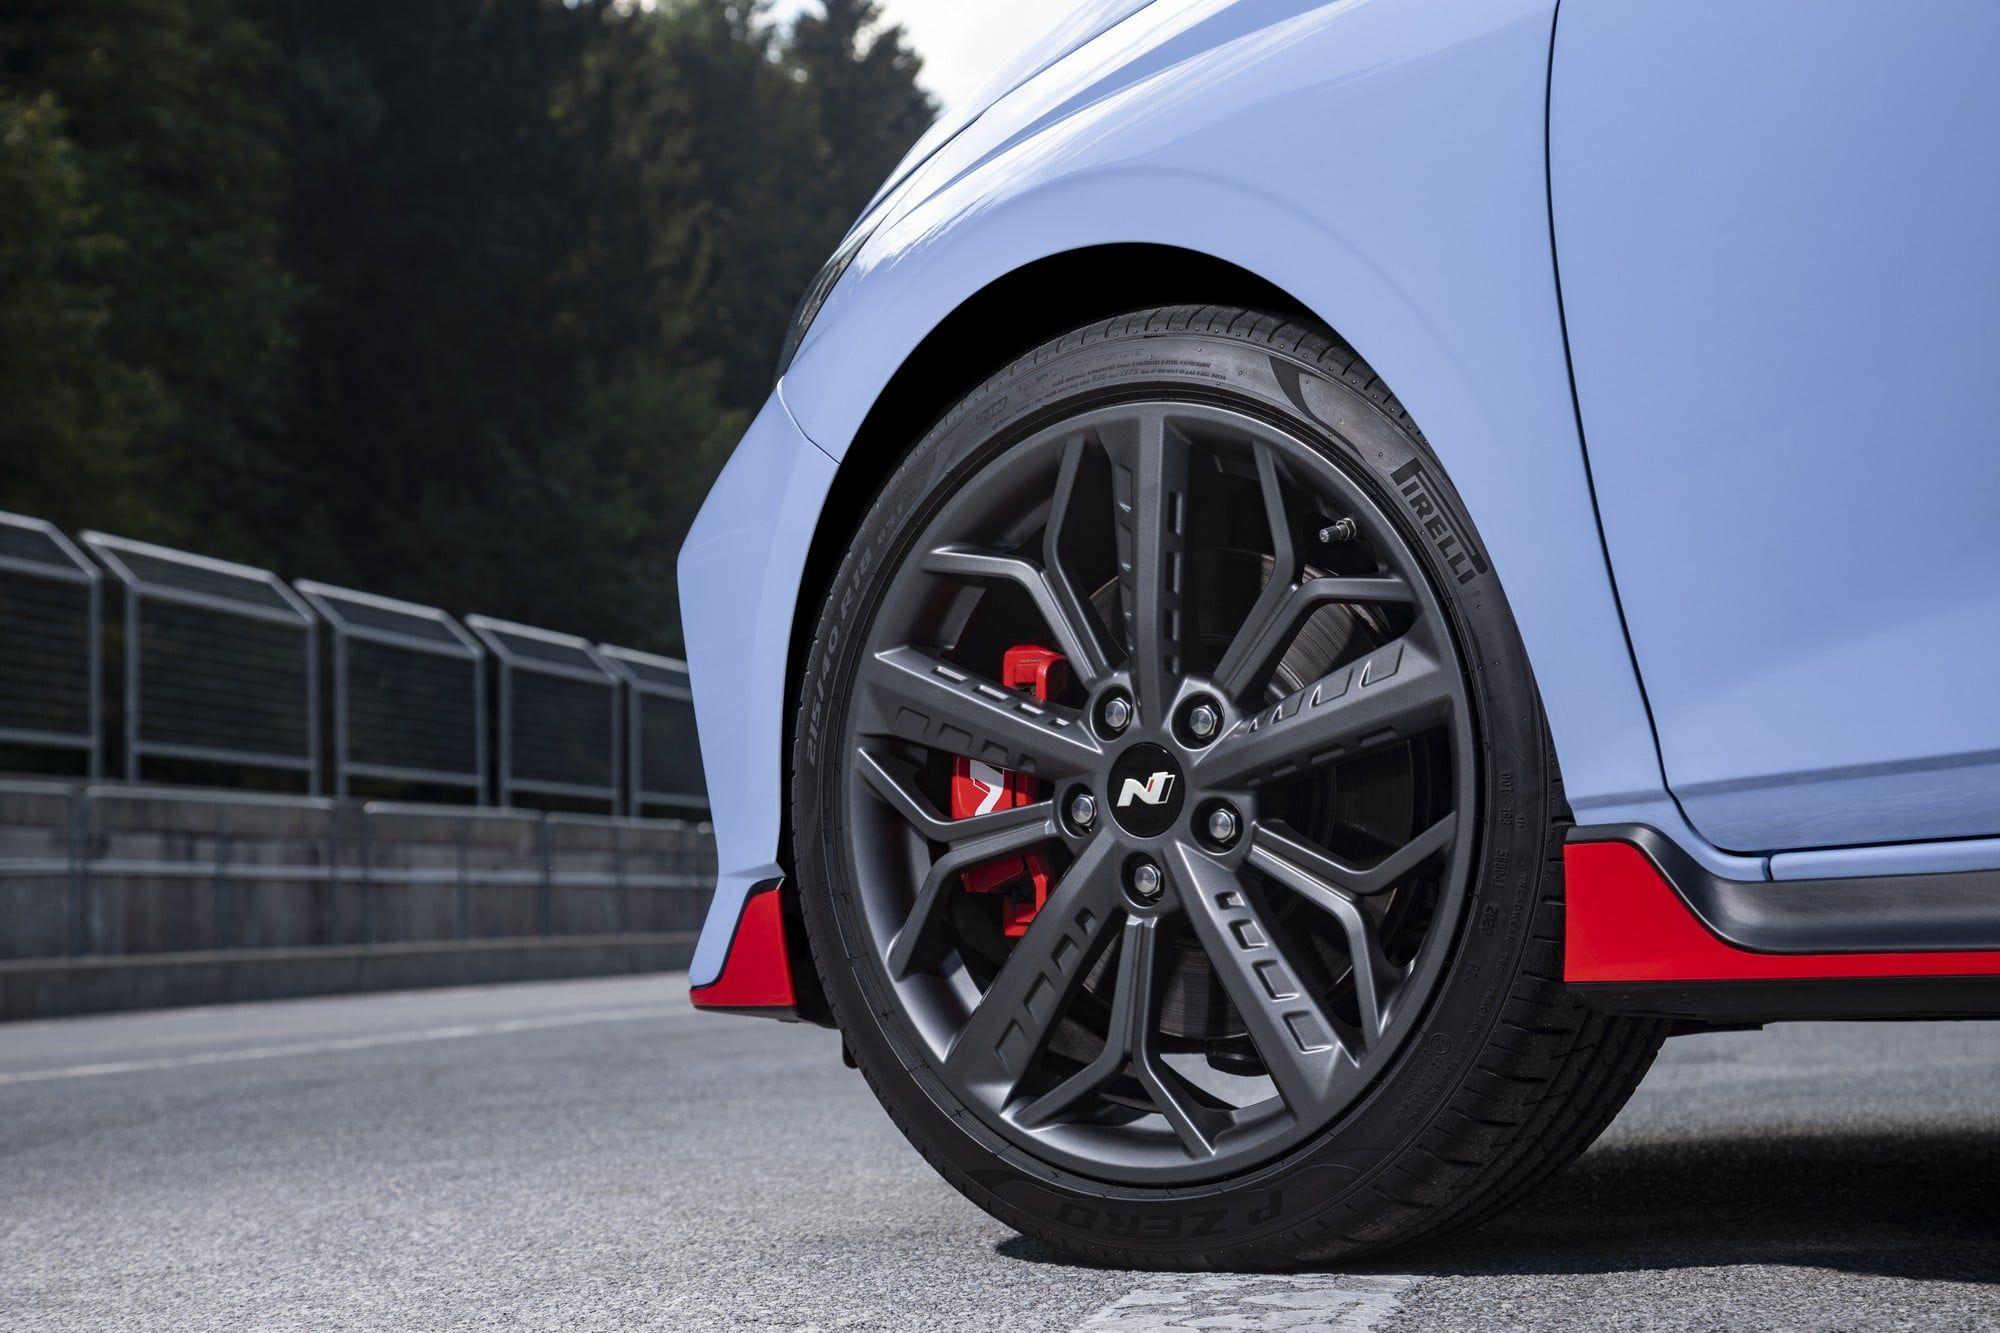 Nouvelle Hyundai i20 N prix